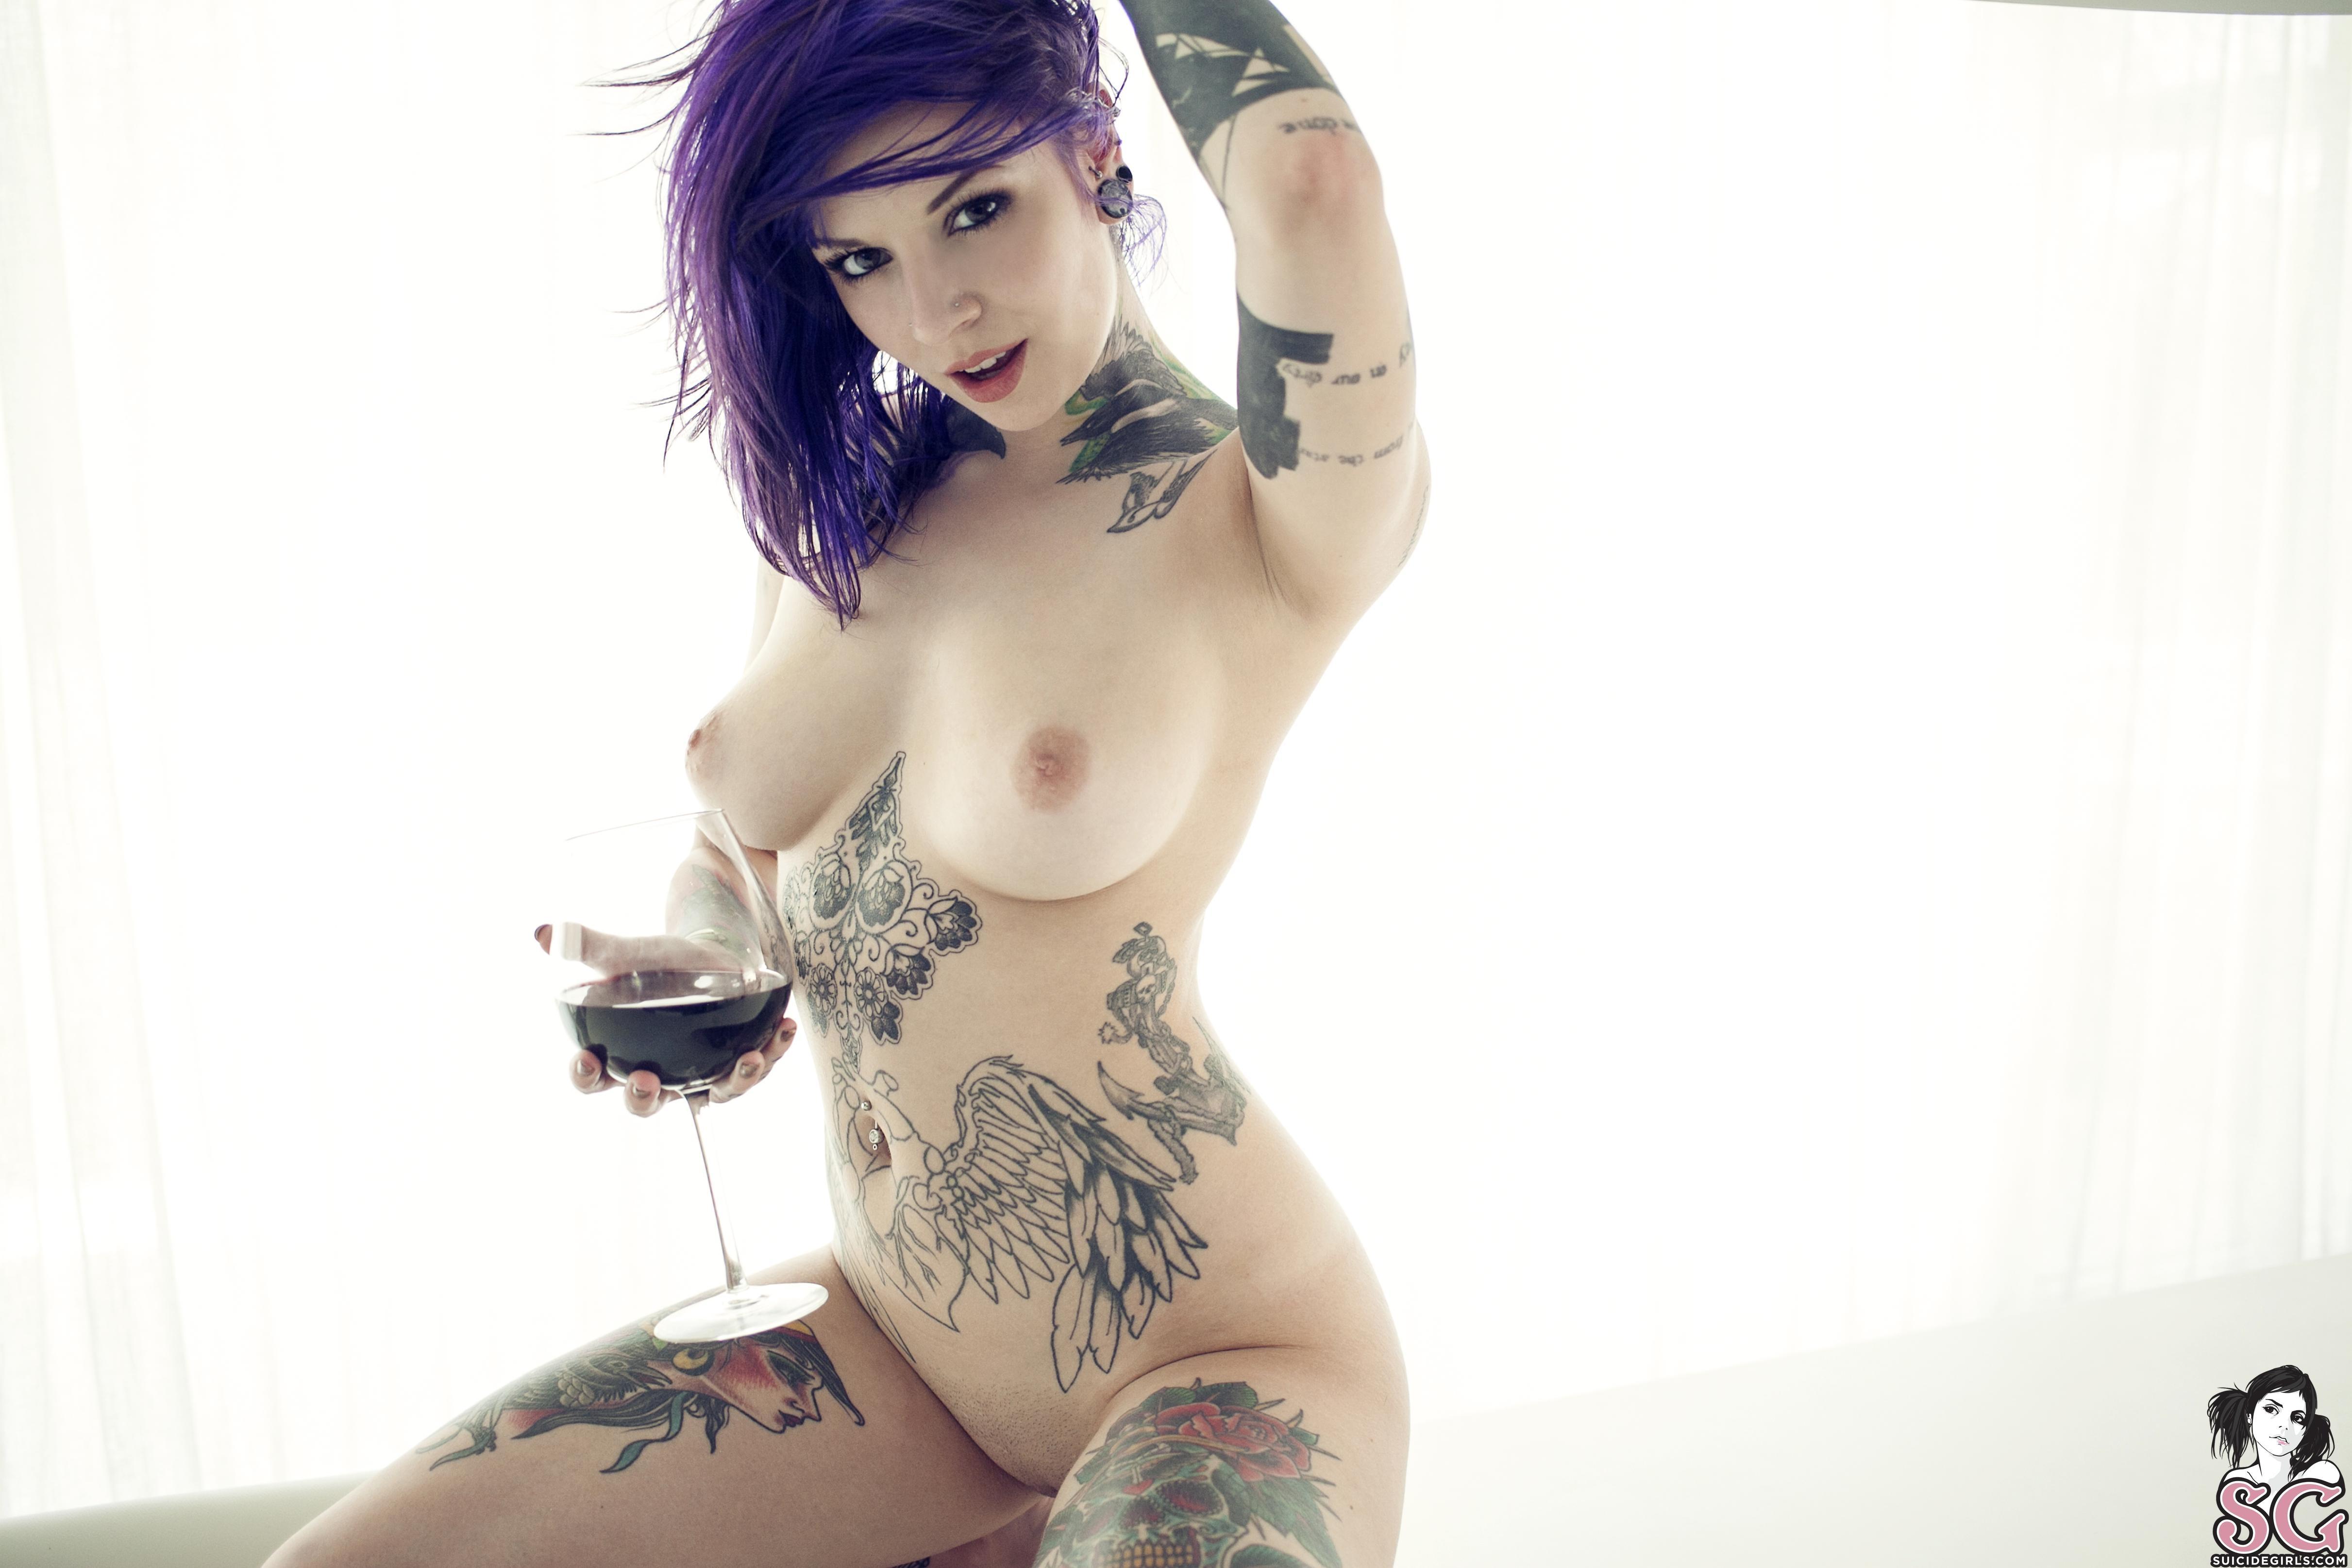 big boob tattooed women naked